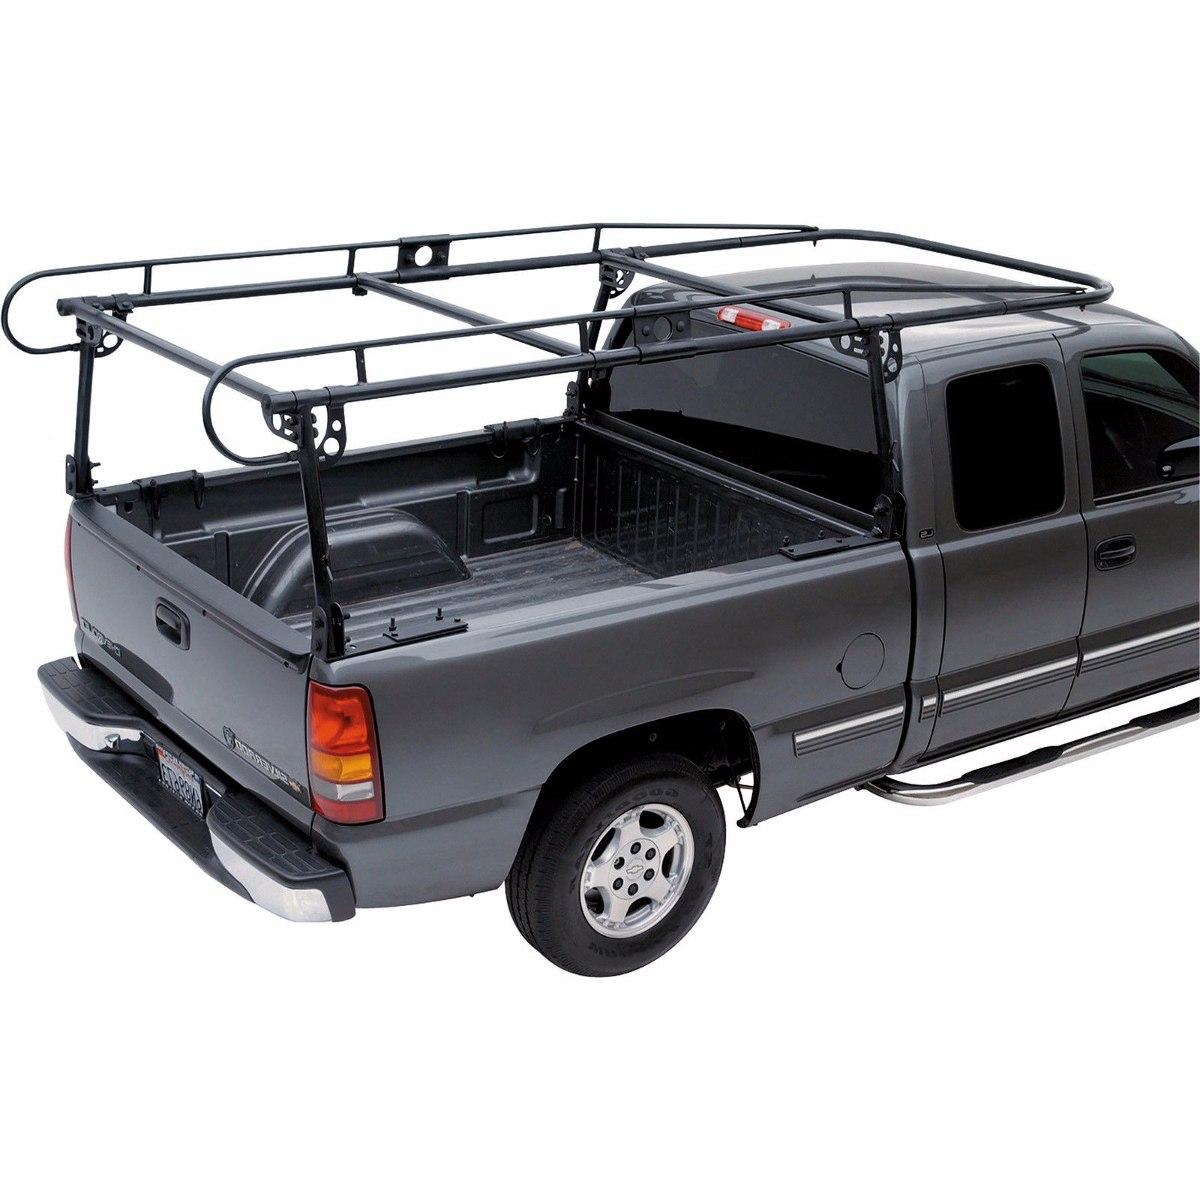 Portaequipaje Universal Carro Pickup Suv Camioneta 1000